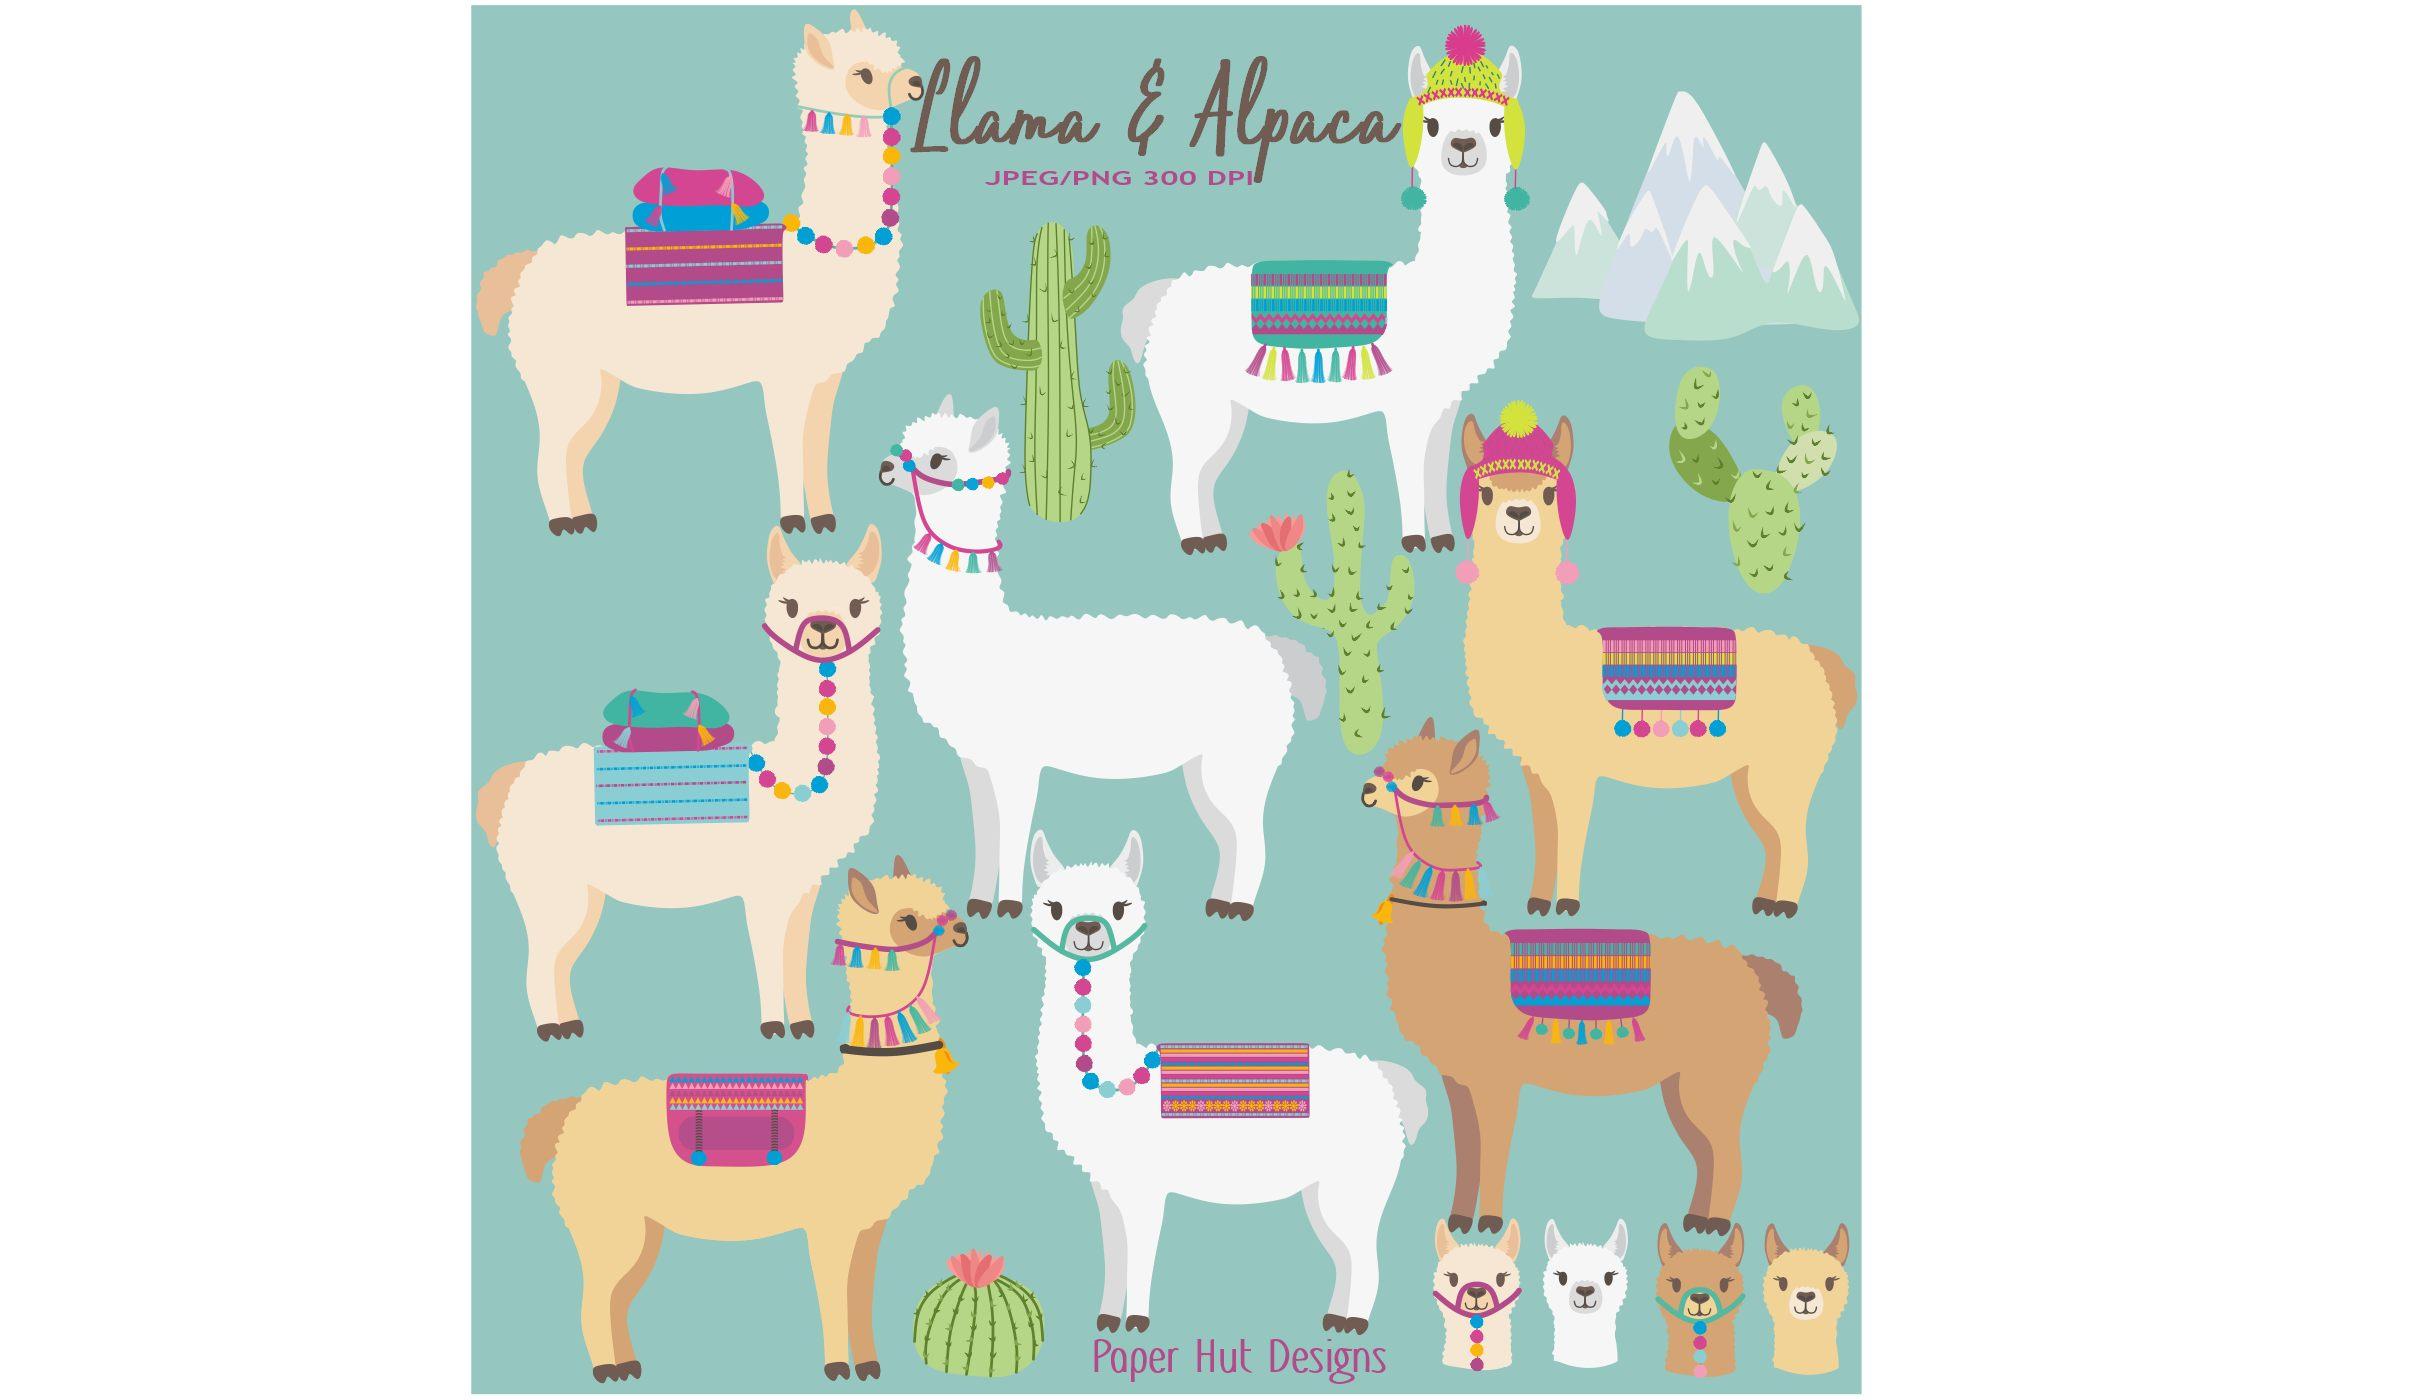 Alpaca clipart images clipart transparent library Llama and Alpaca Clipart clipart transparent library